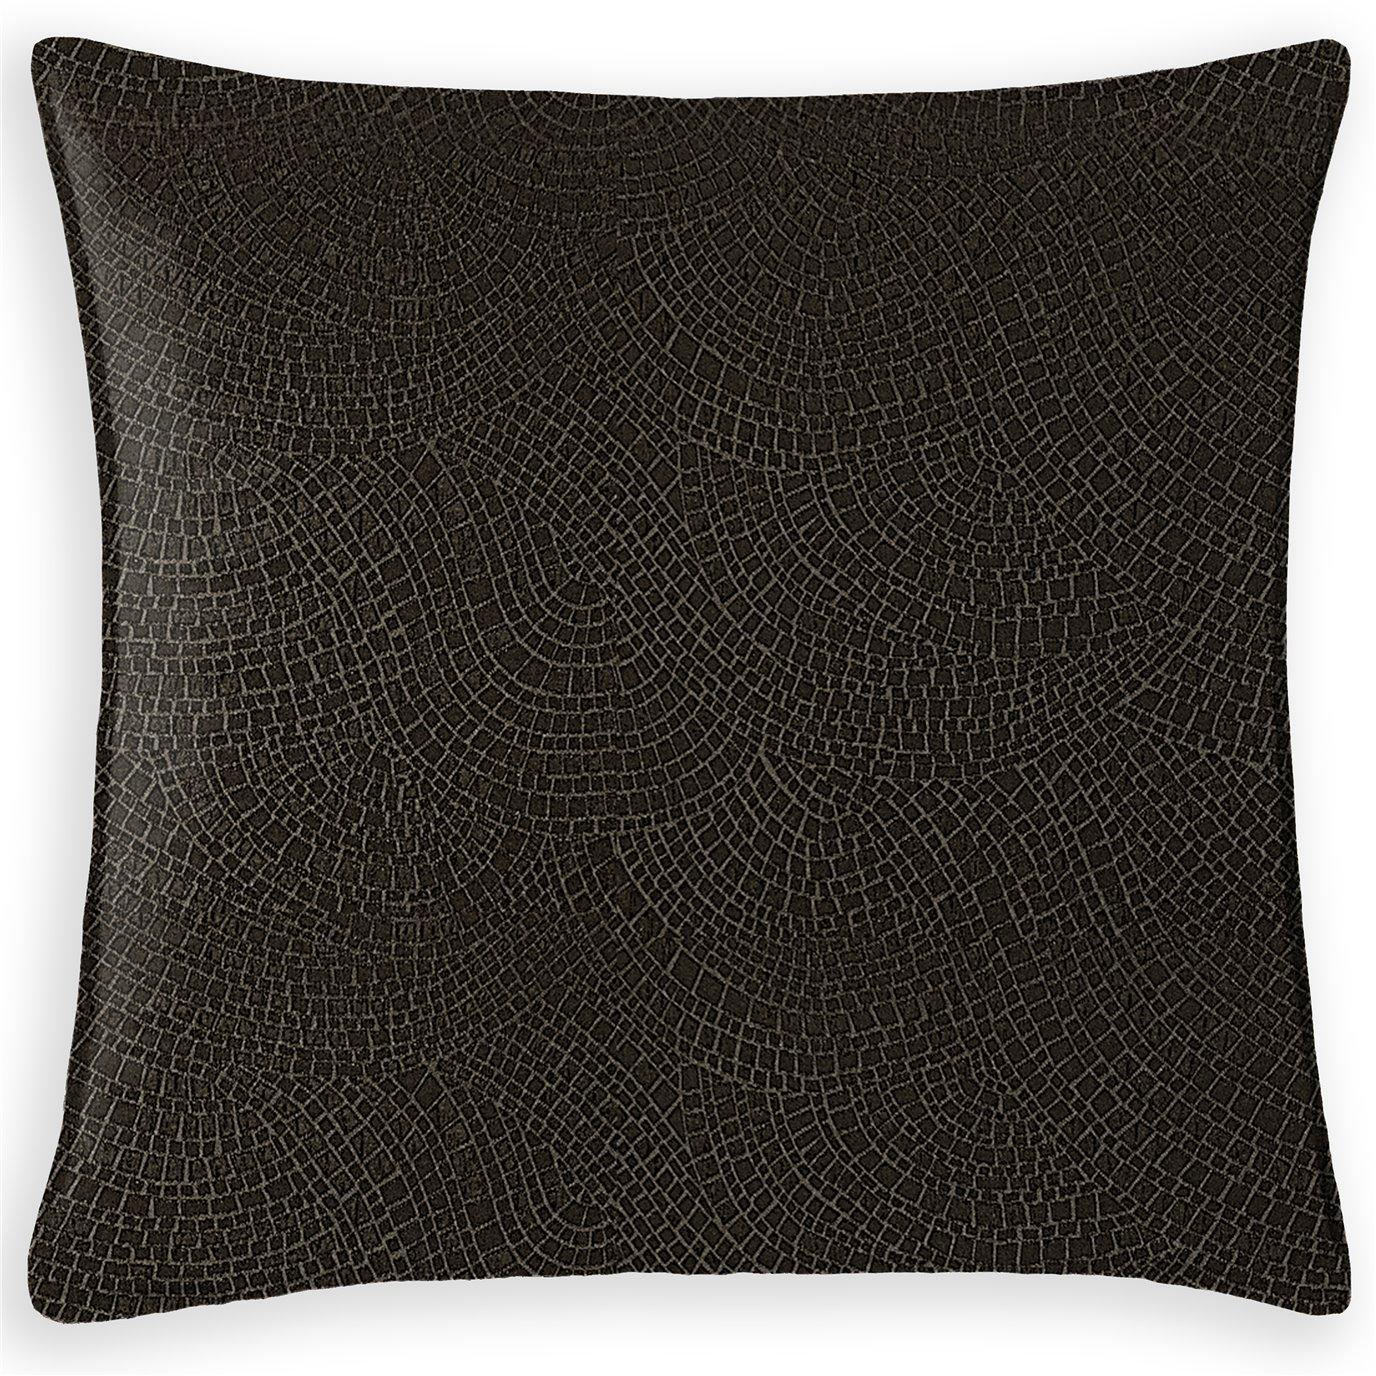 Hickory Lane Pillow Sham - Euro